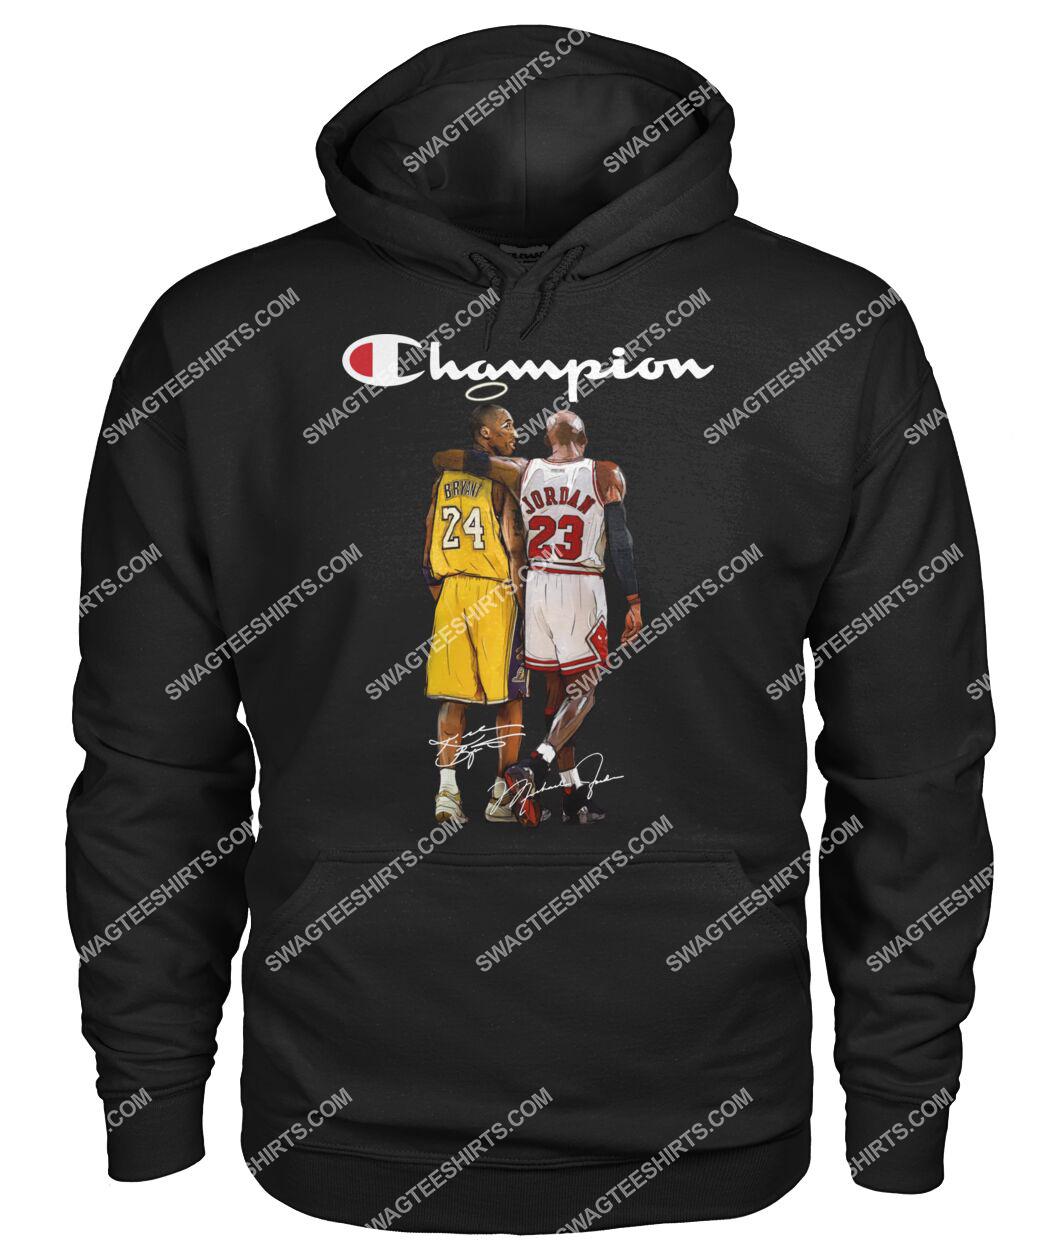 champion kobe bryant and michael jordan signature hoodie 1